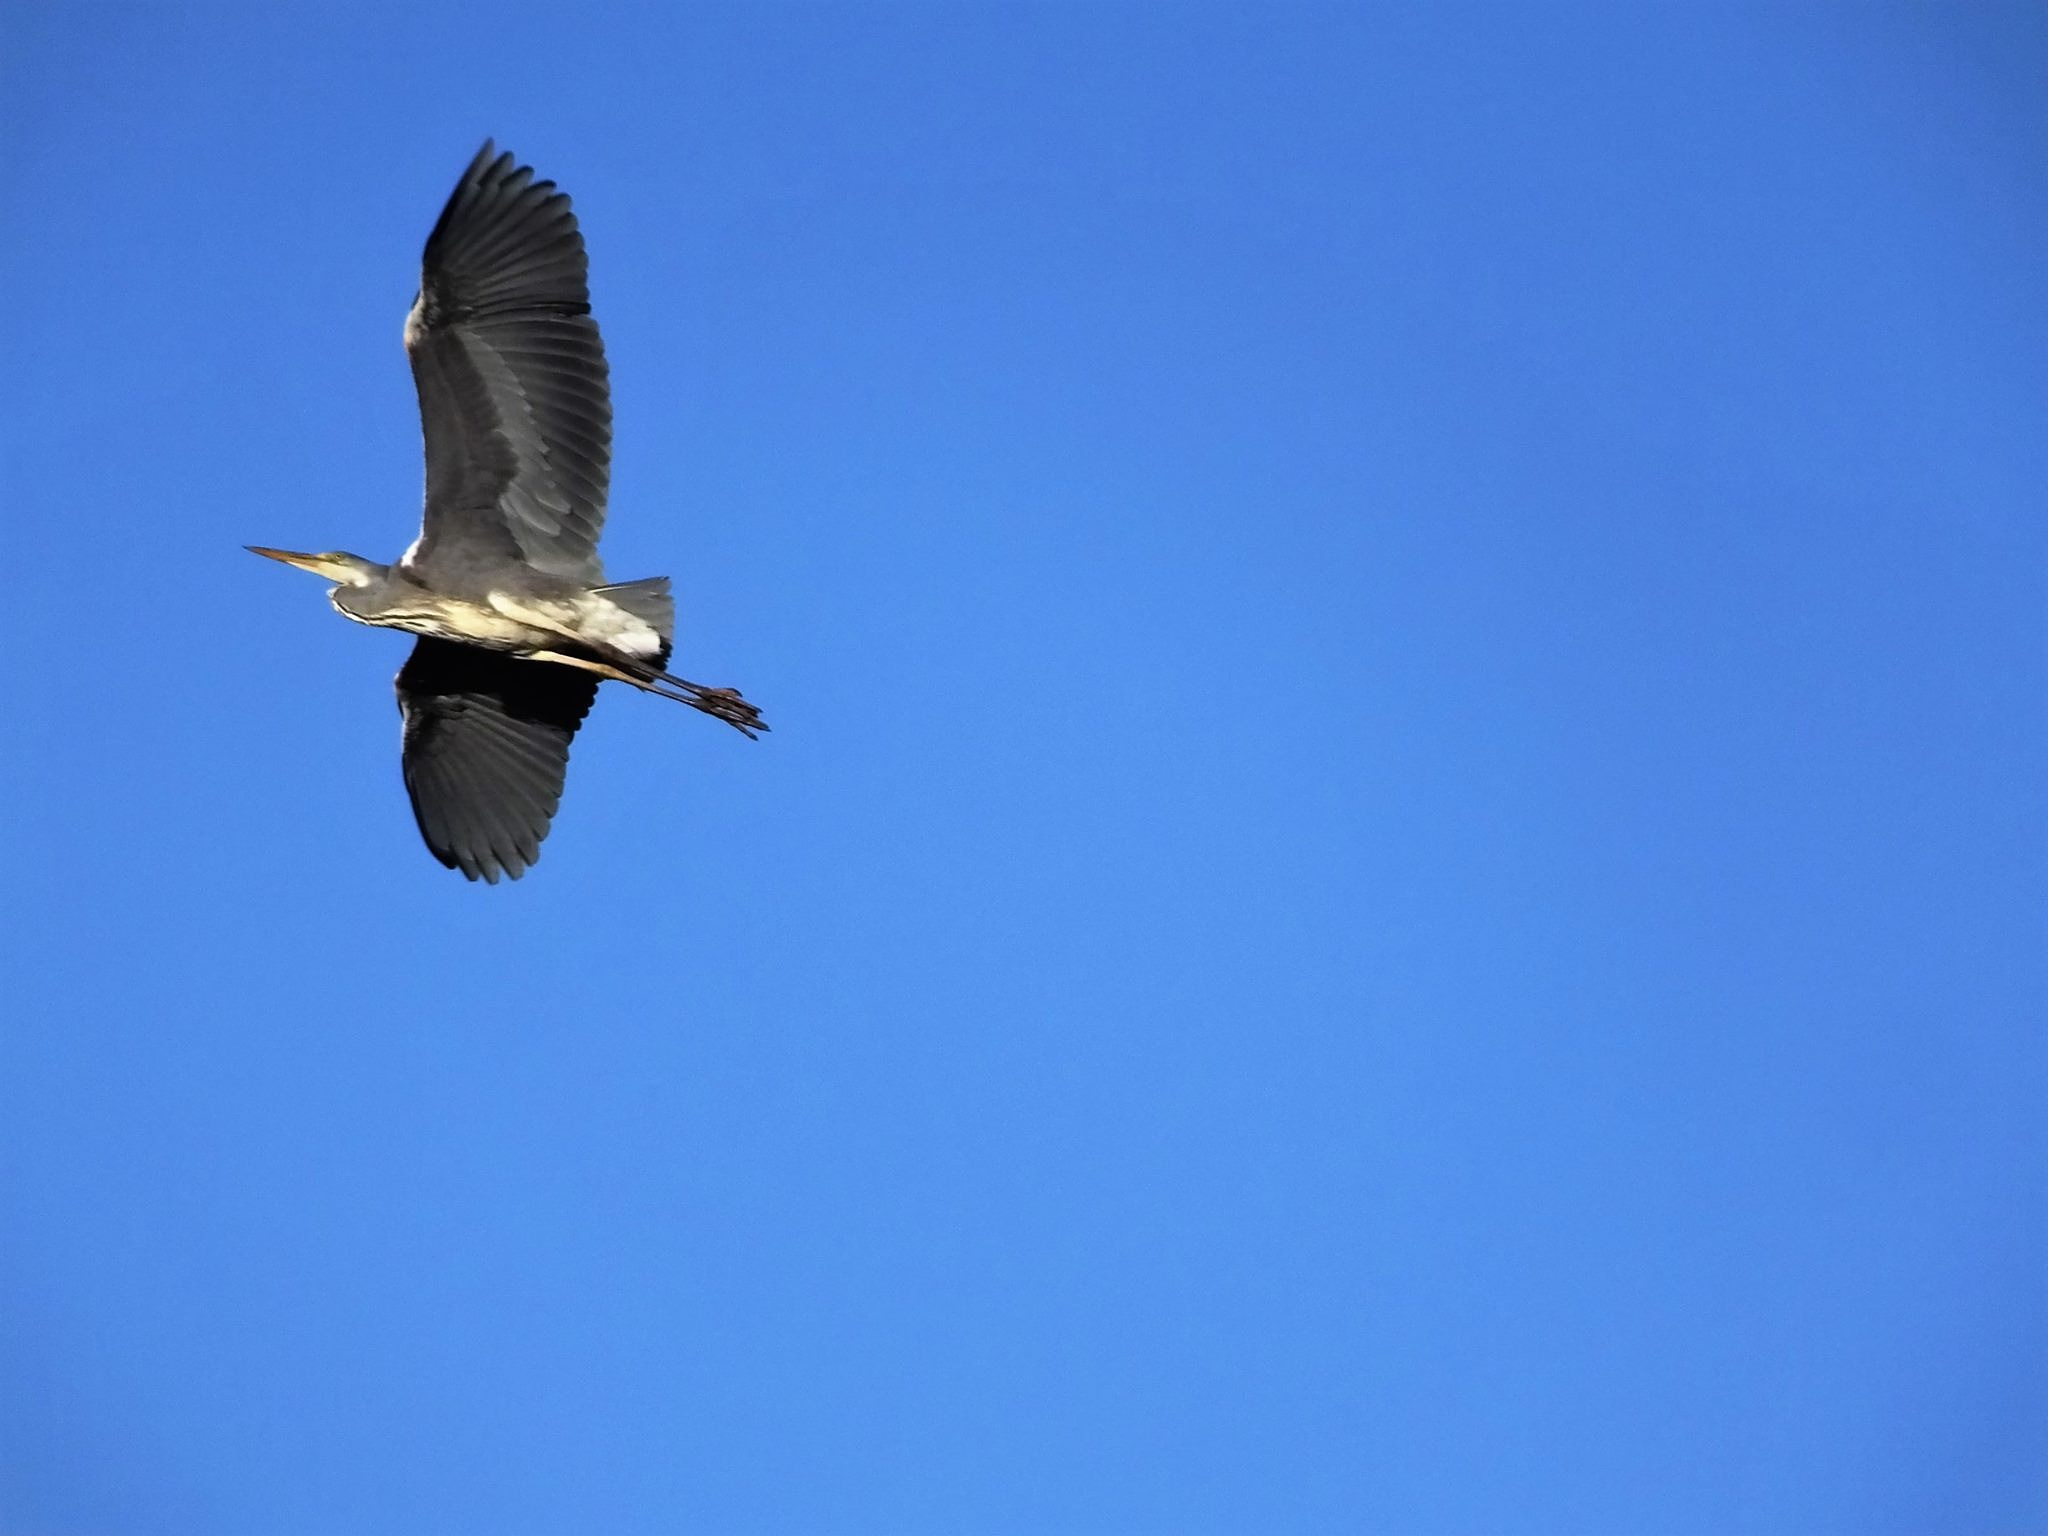 Free lika a Bird by hans.j.svensson